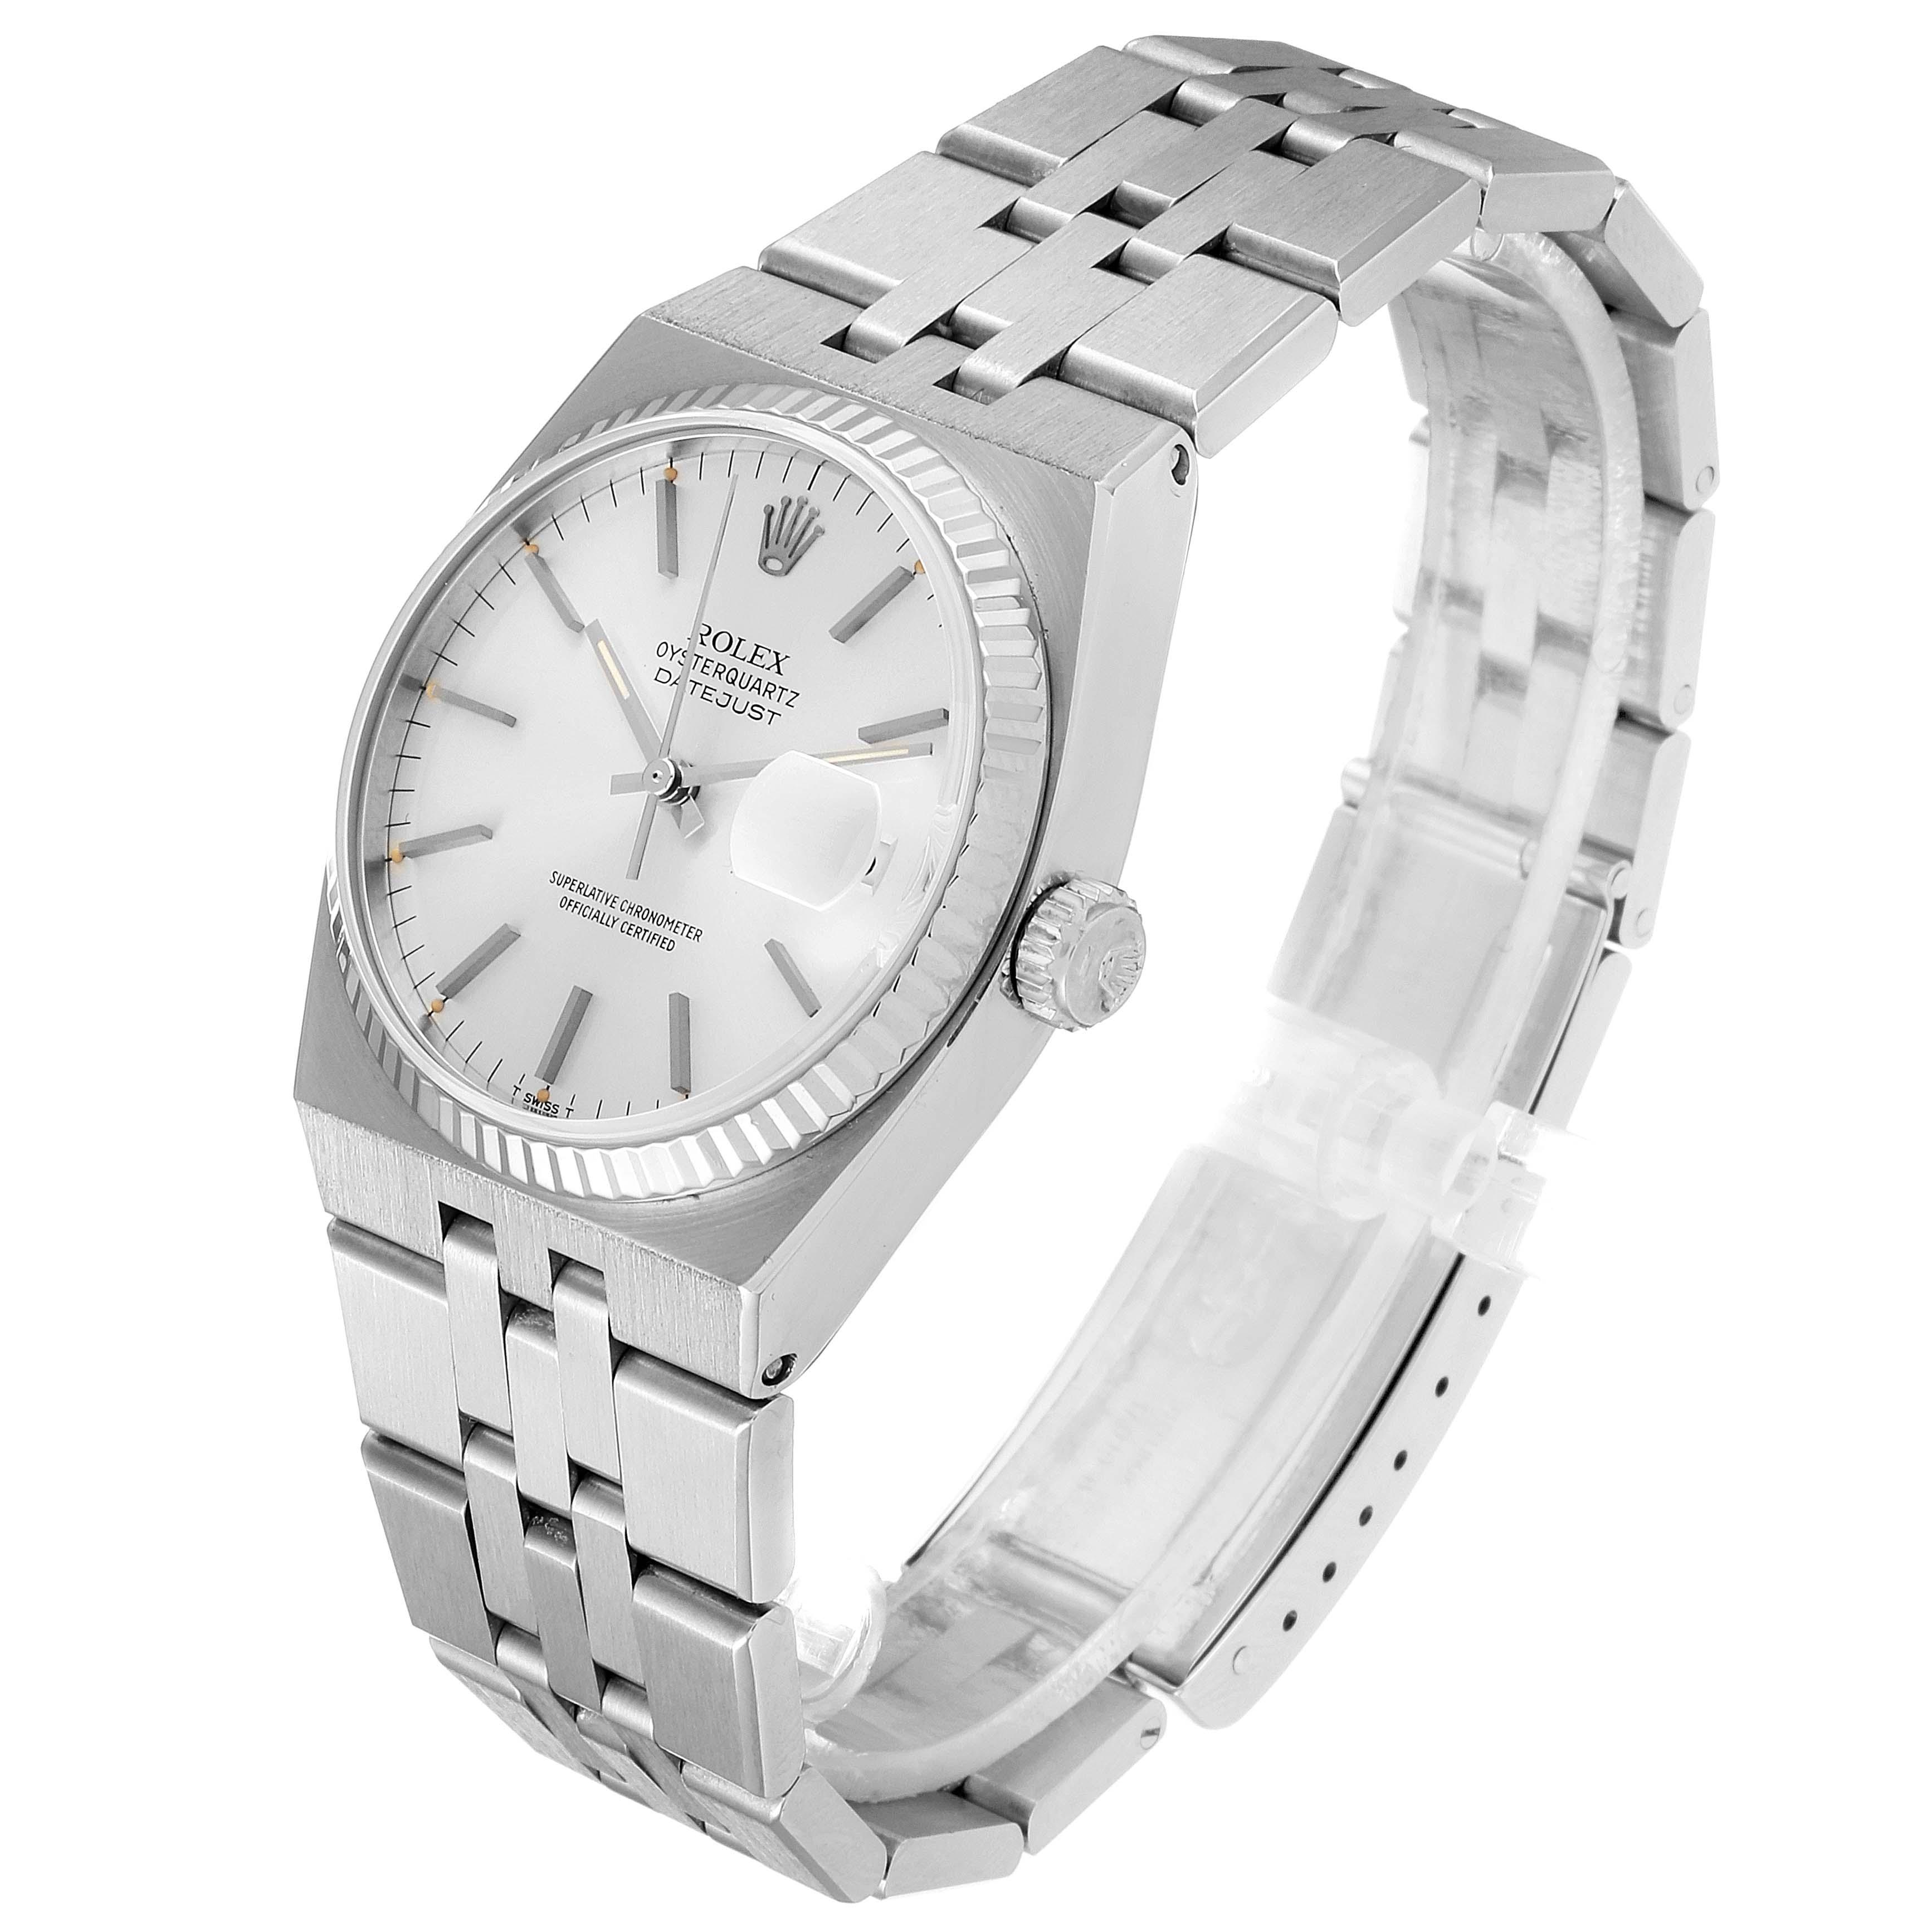 Rolex Oysterquartz Datejust Steel White Gold Fluted Bezel Watch 17014 SwissWatchExpo